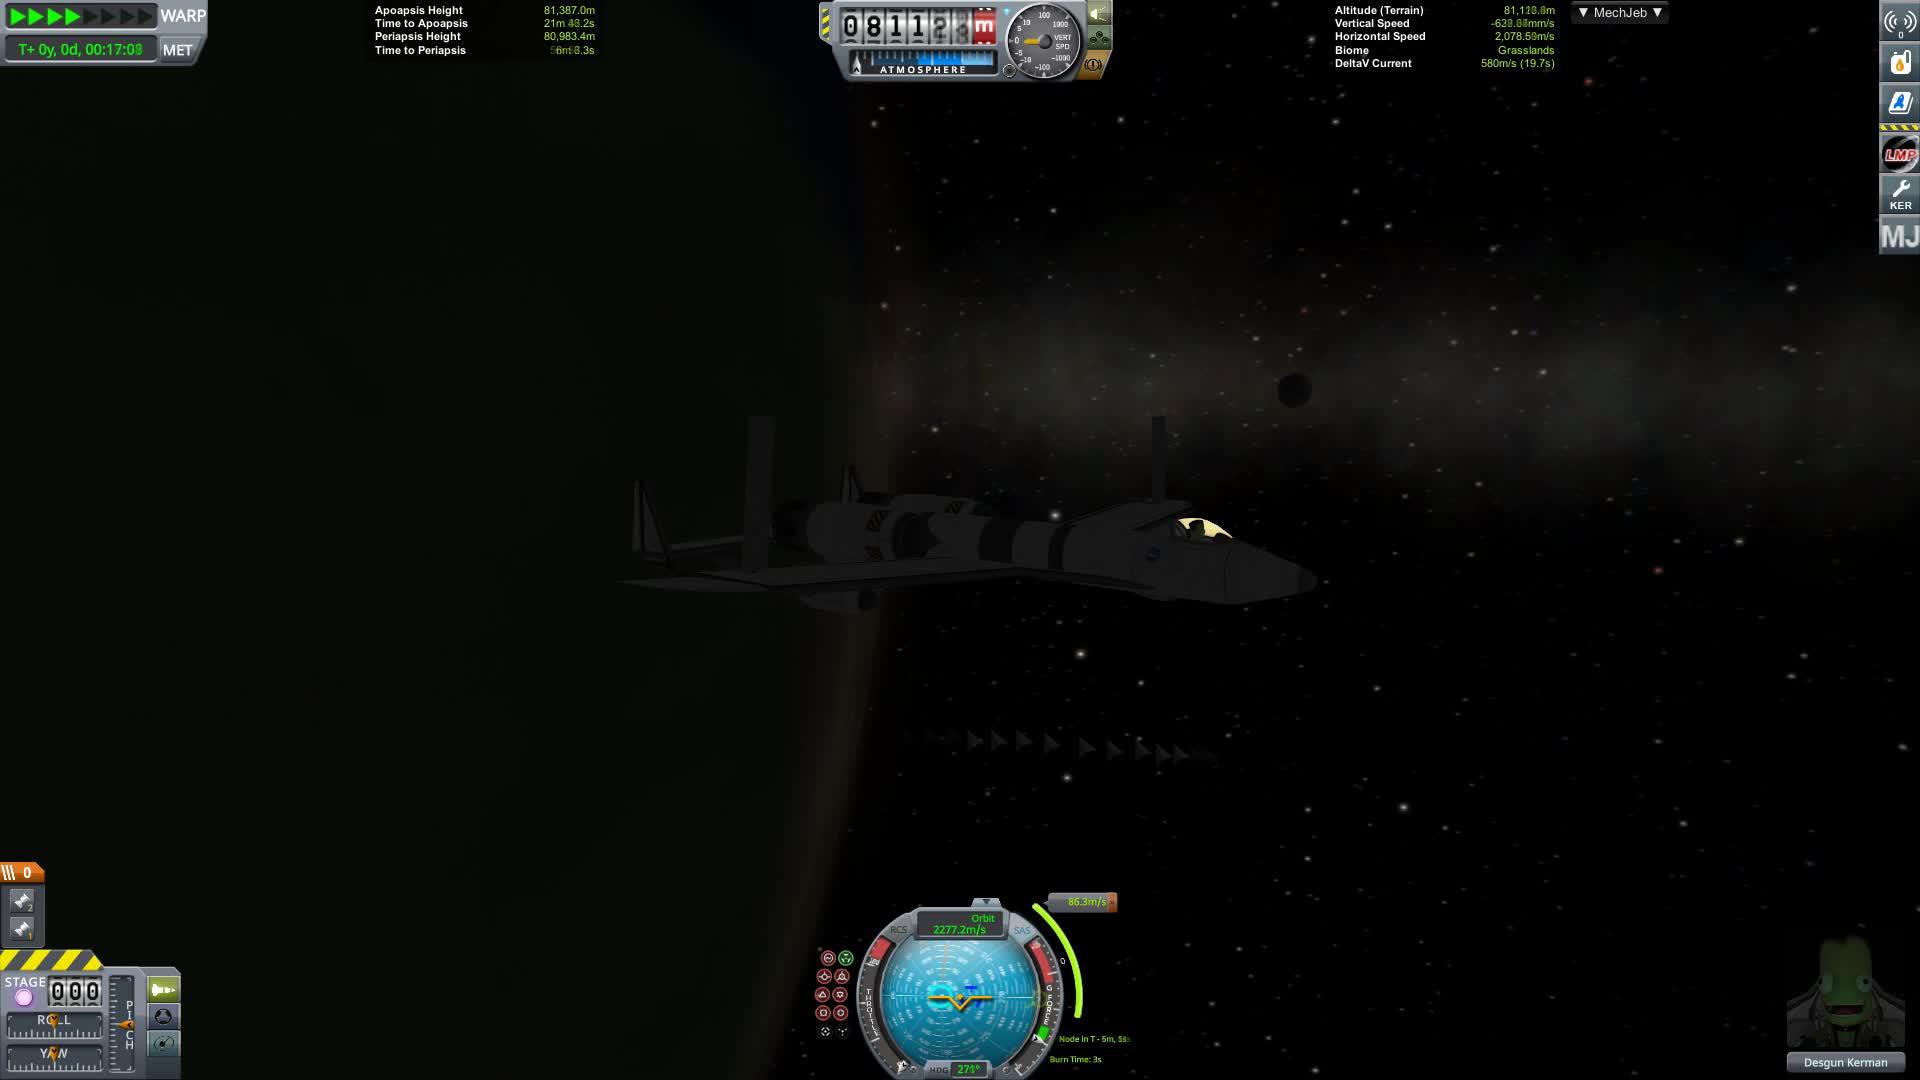 A-10 from Orbit GIFs